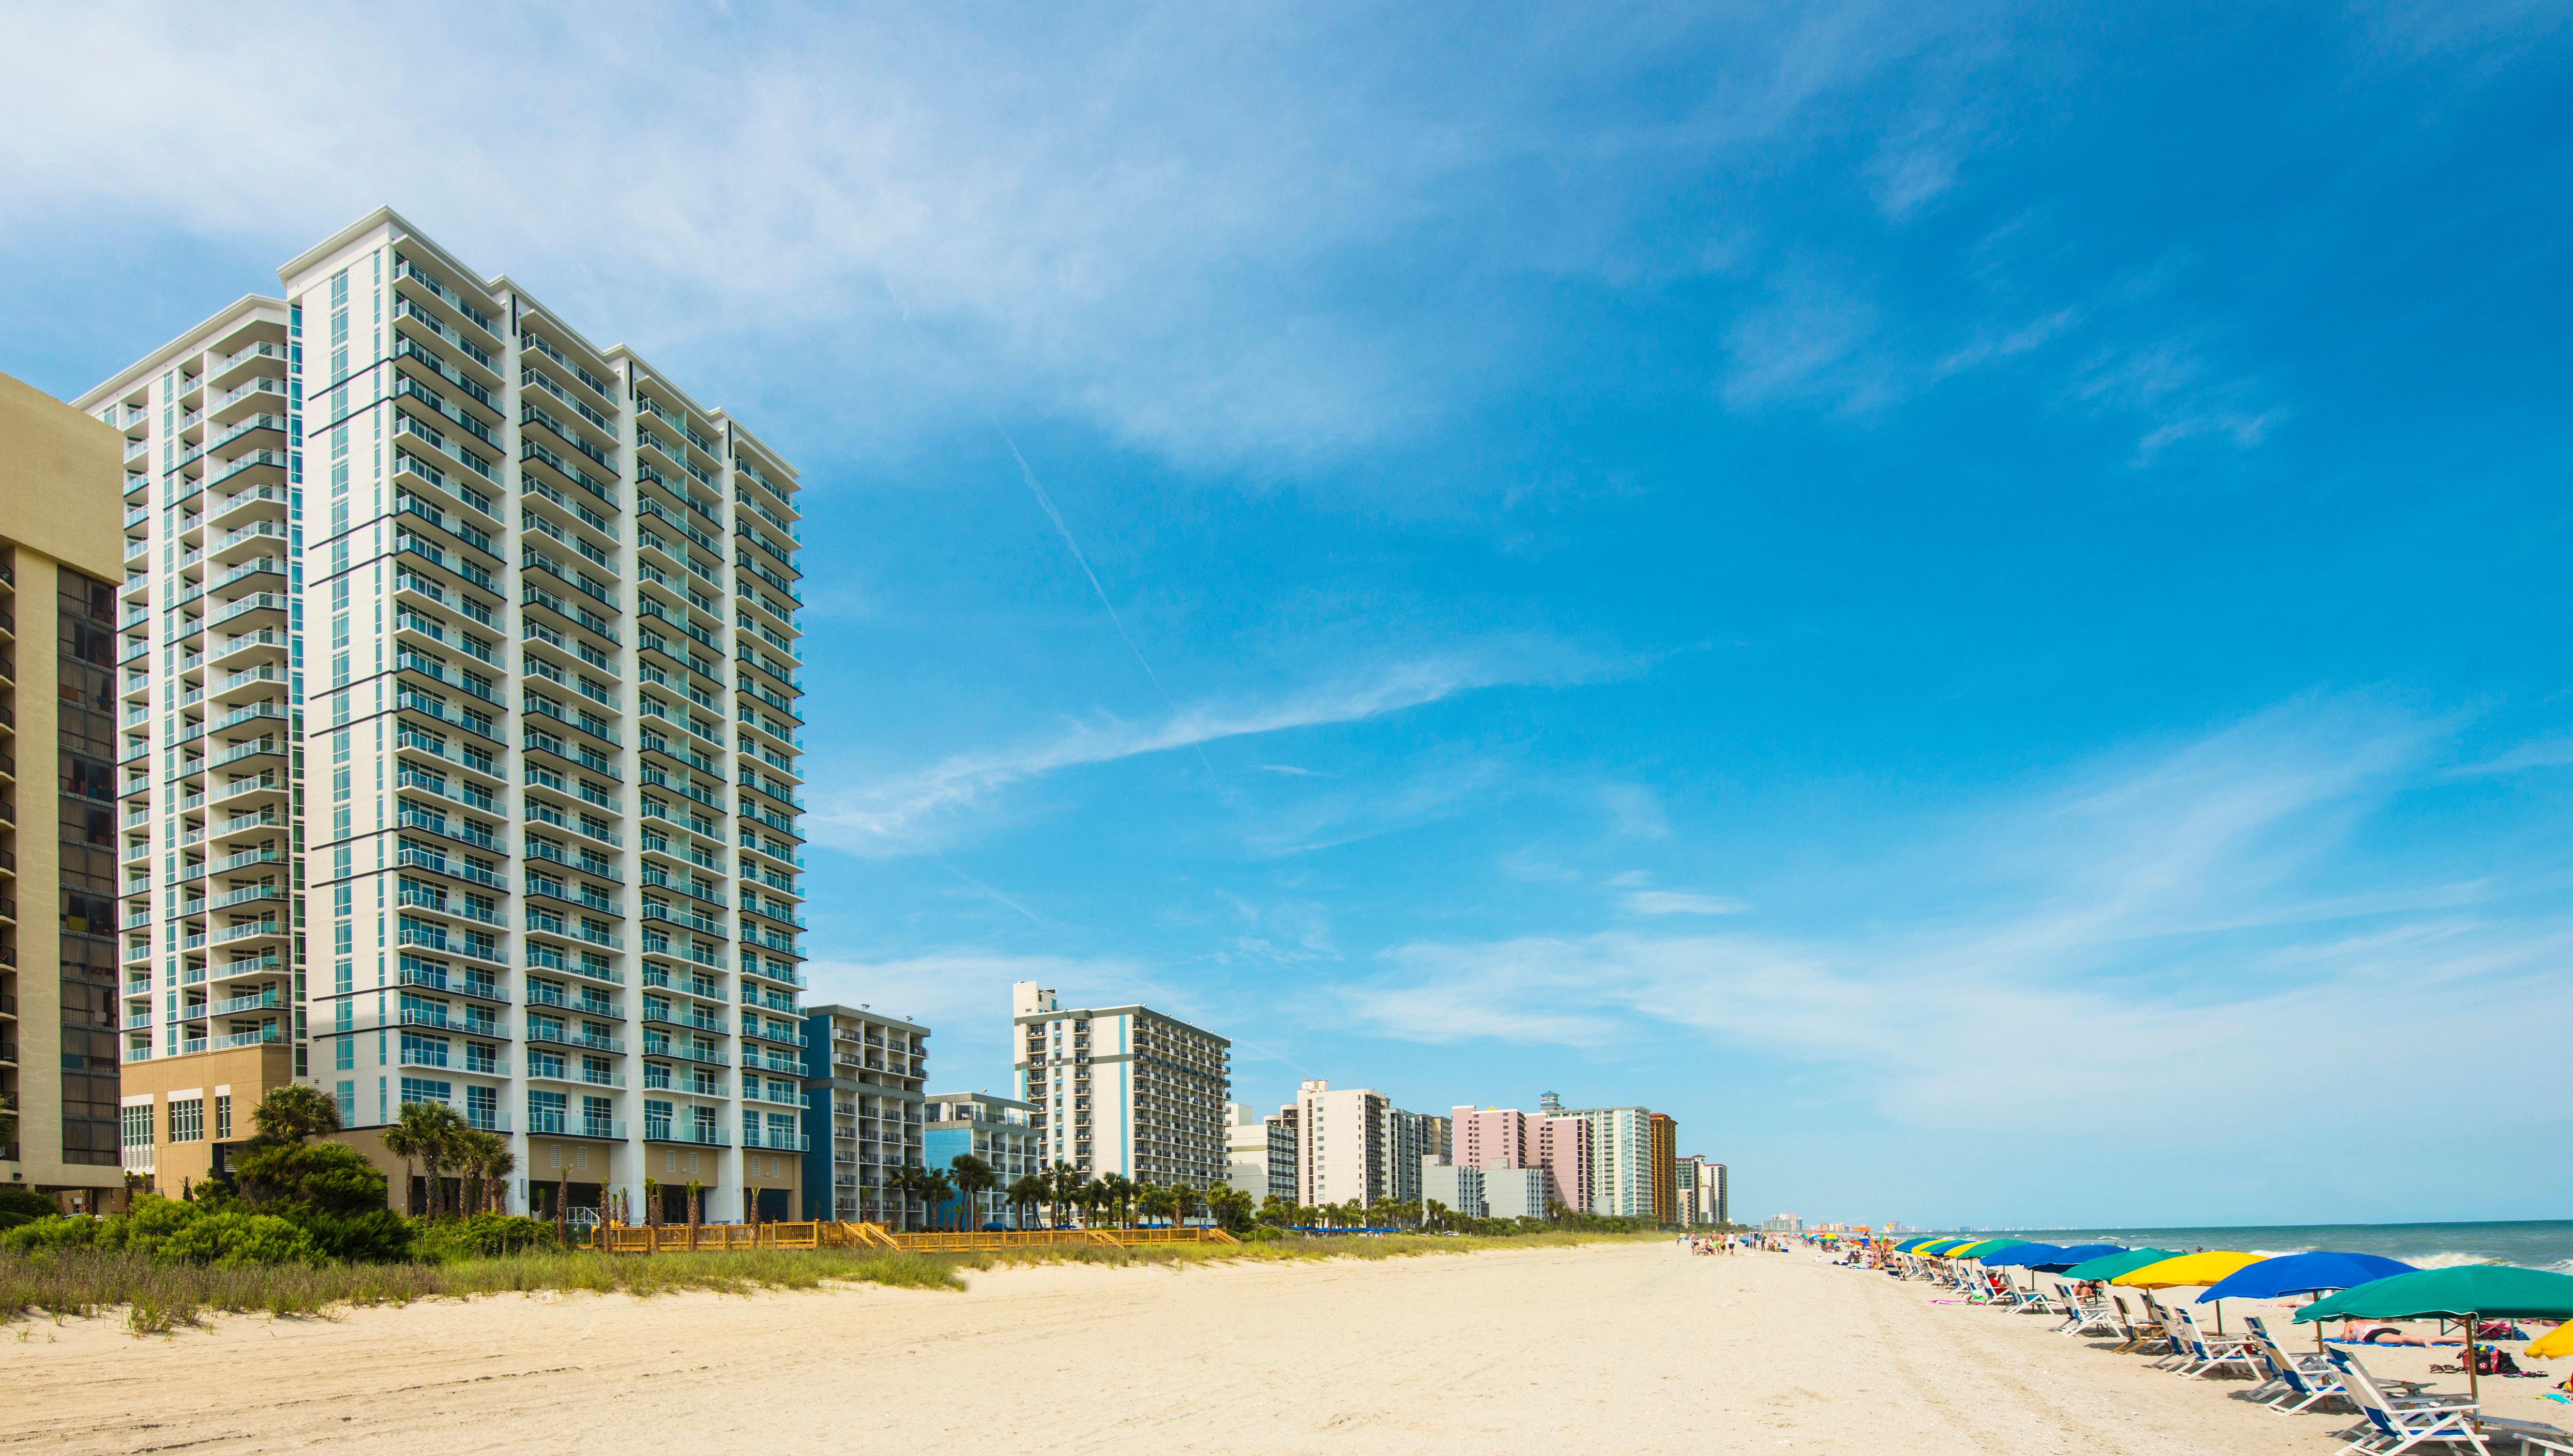 Ocean Blue Resort Myrtly Beach